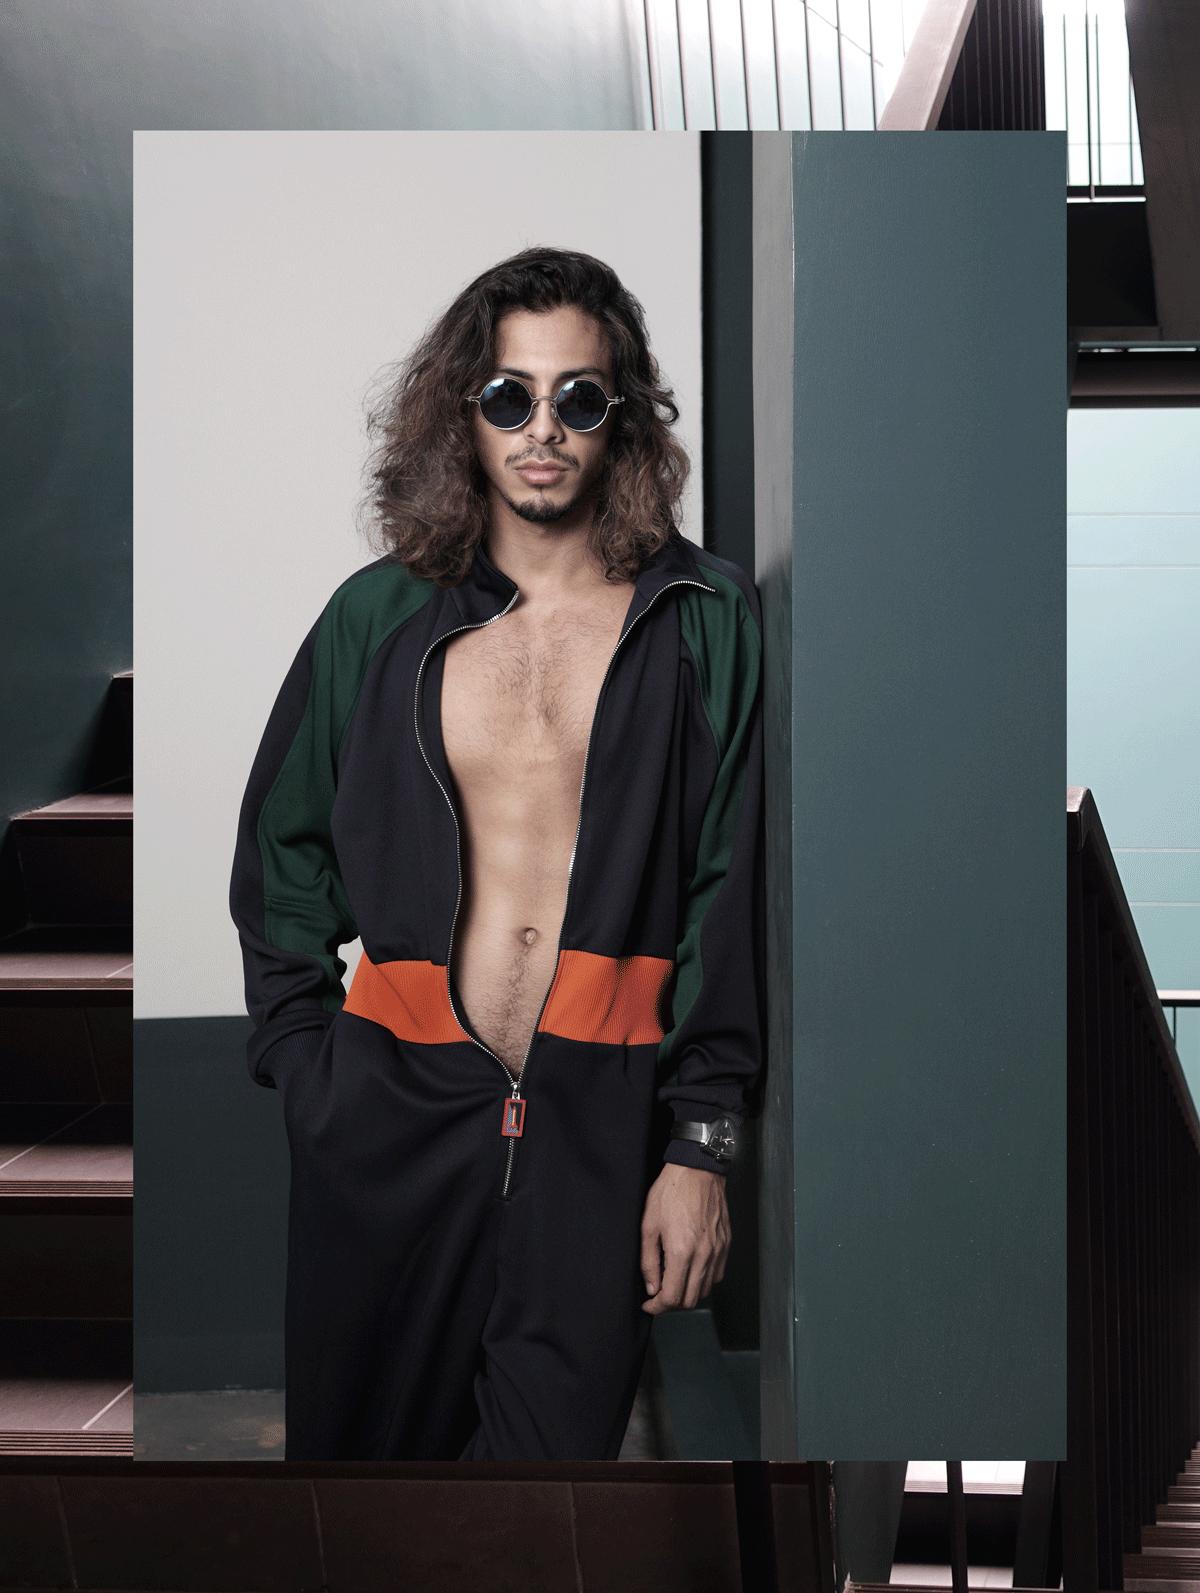 clothes : Everyday Karmakamet / sunglasses : TAVAT / watch : Hamilton Ventura Elvis 80